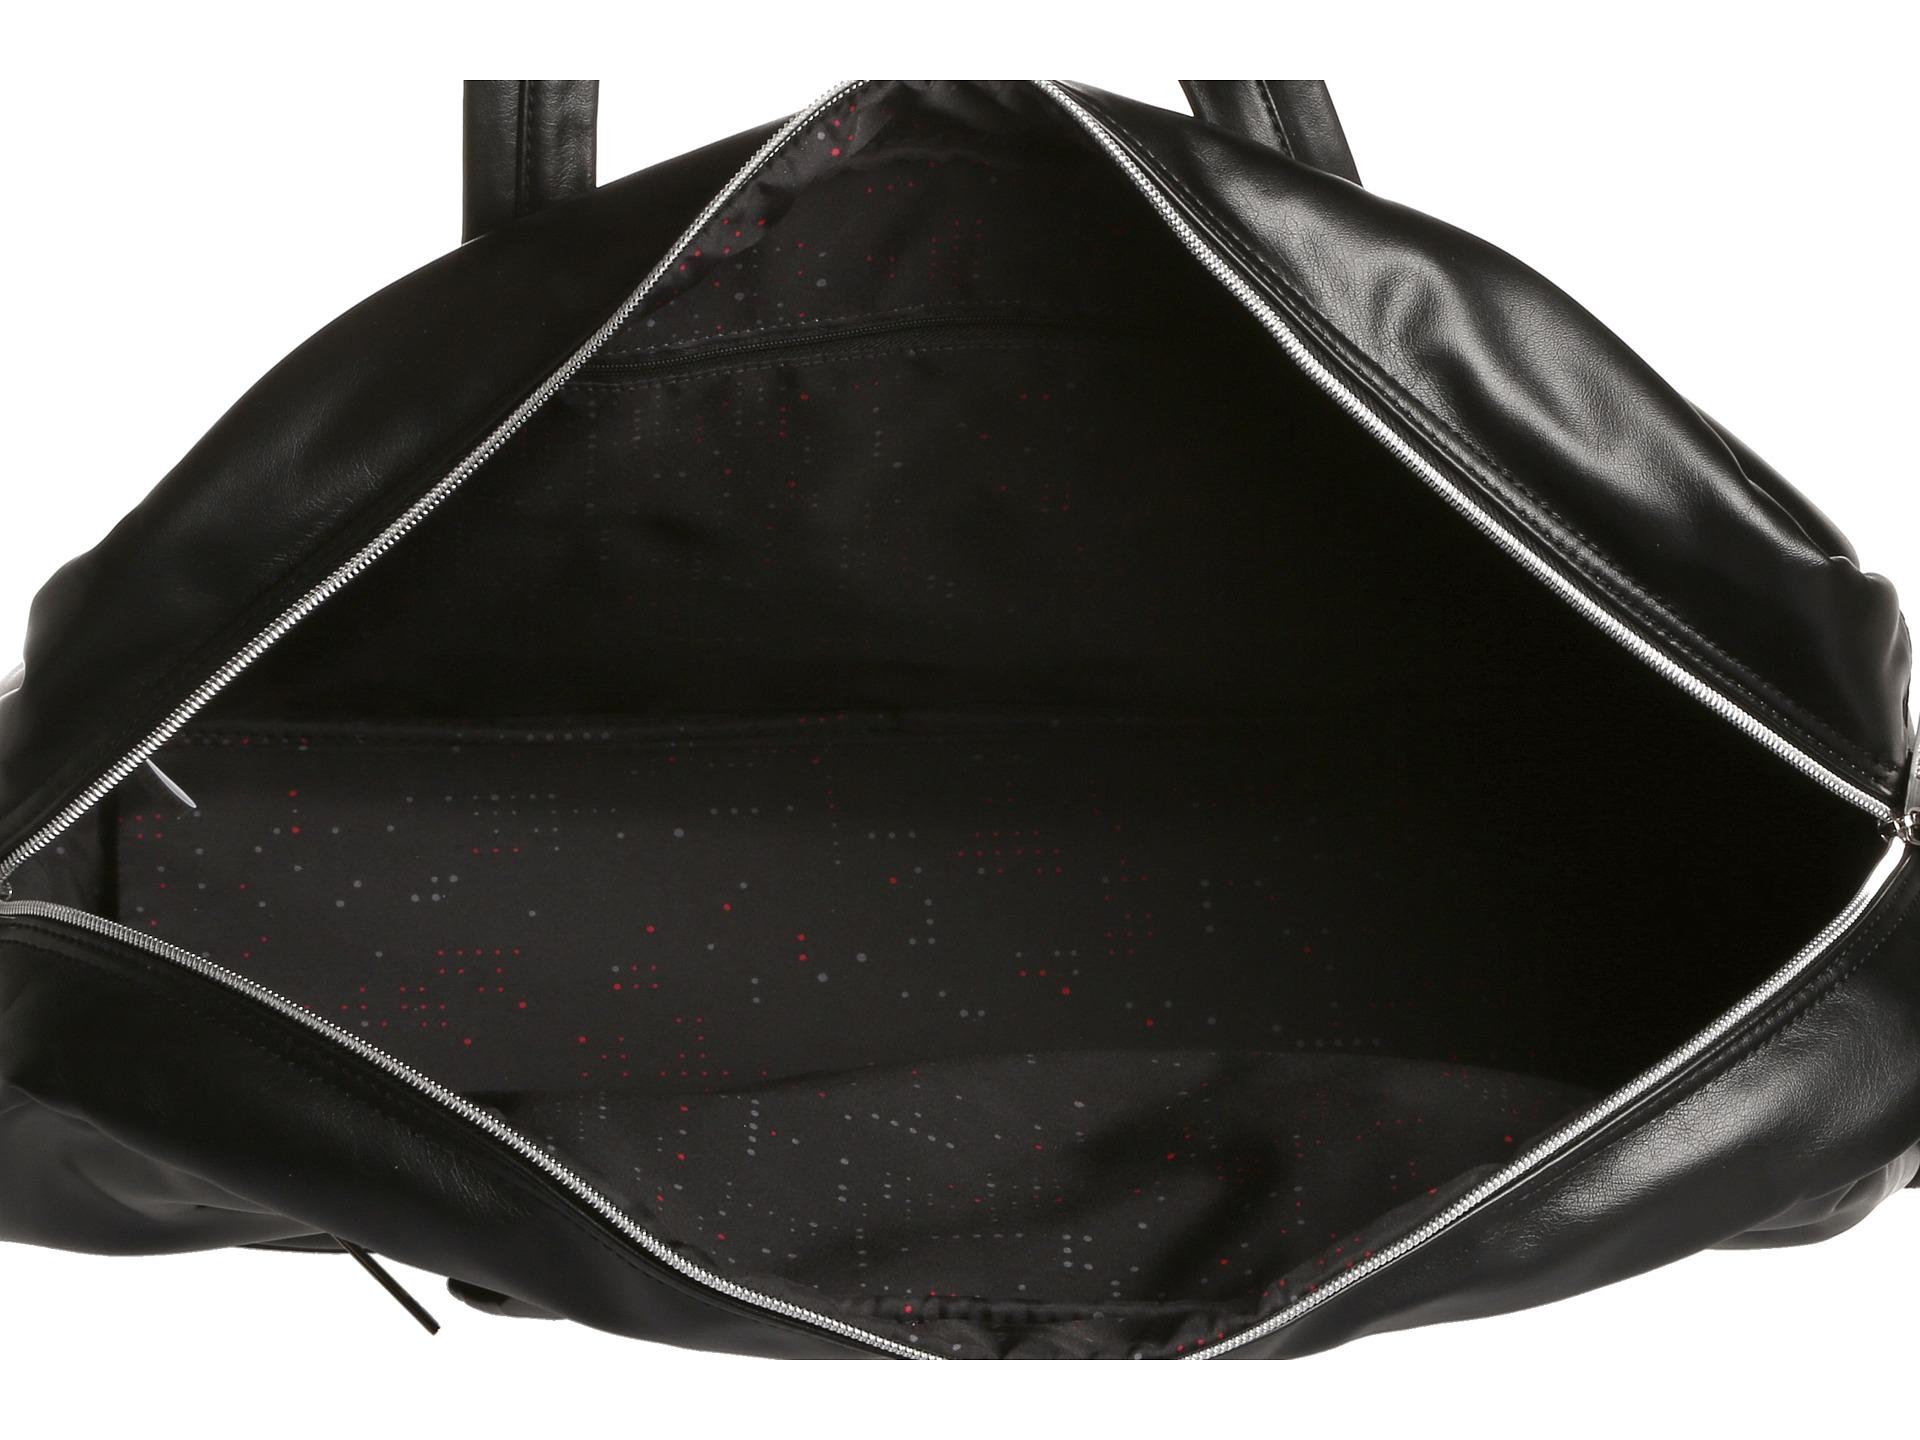 c80f150bbf92 Lyst - PUMA Ferrari Ls Weekender Bag in Black for Men